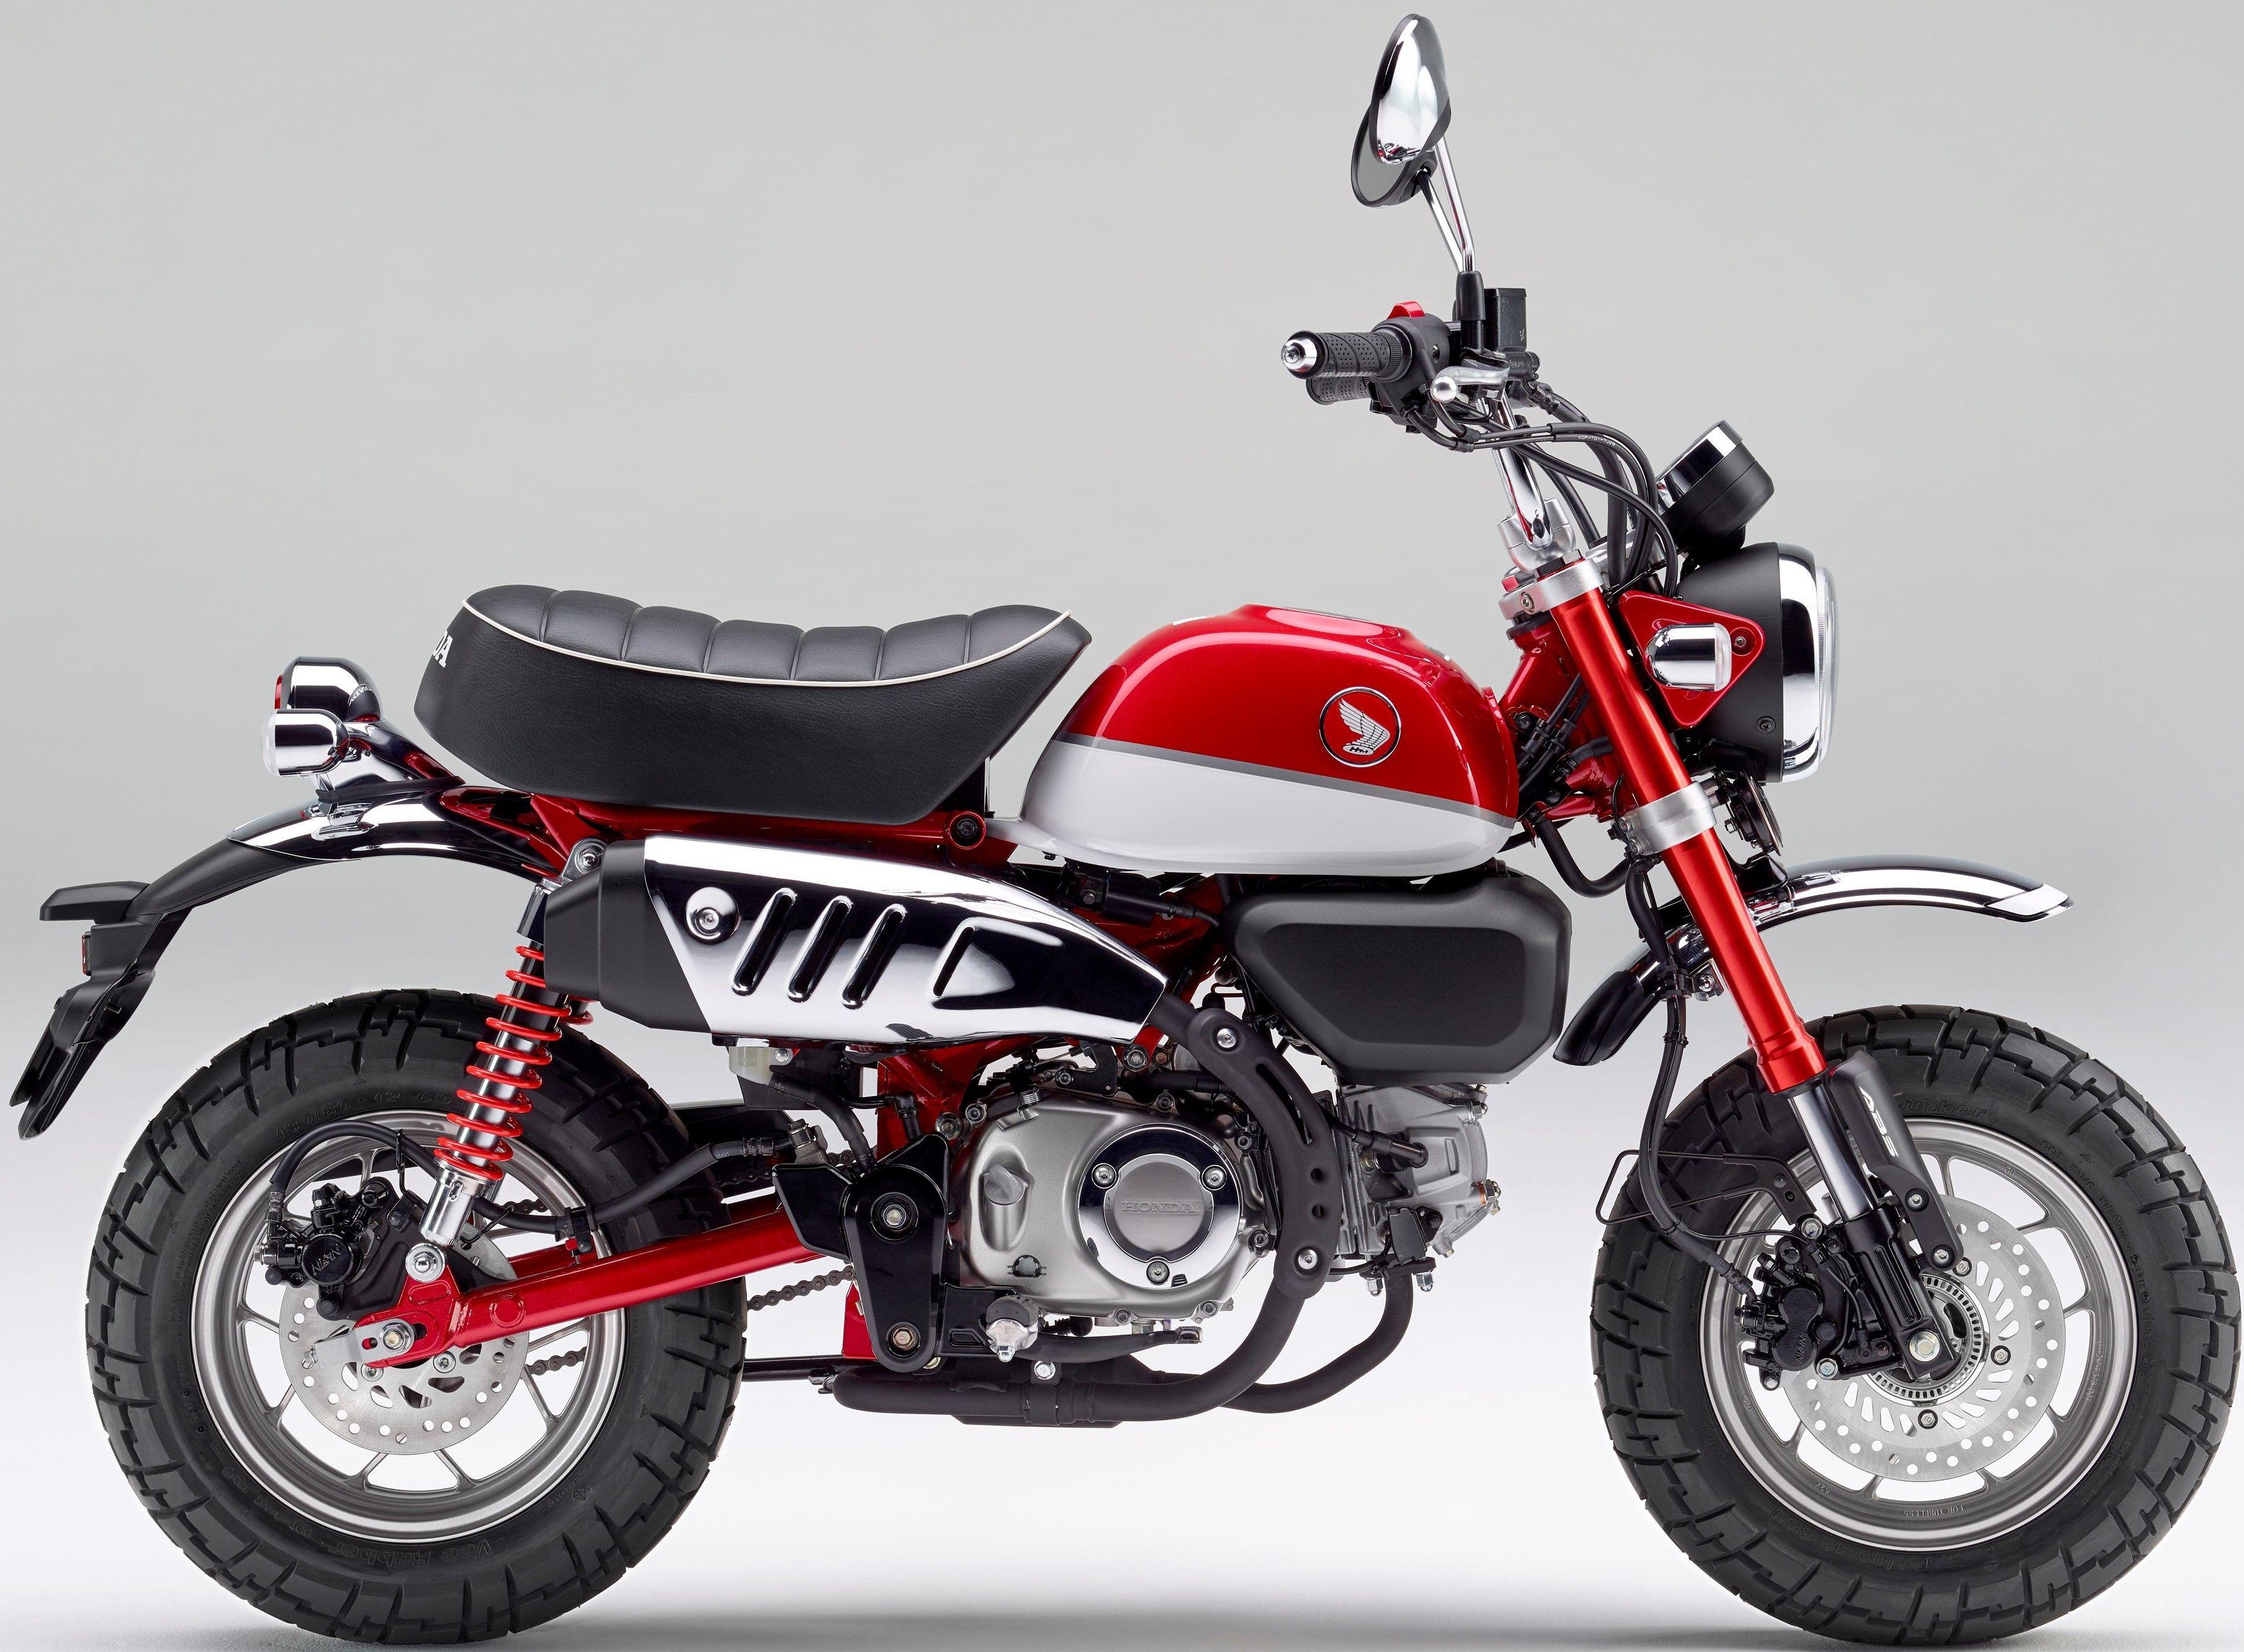 Nuova Honda Monkey 2018 Outdoor Fun Mini Bike Motor Scooters